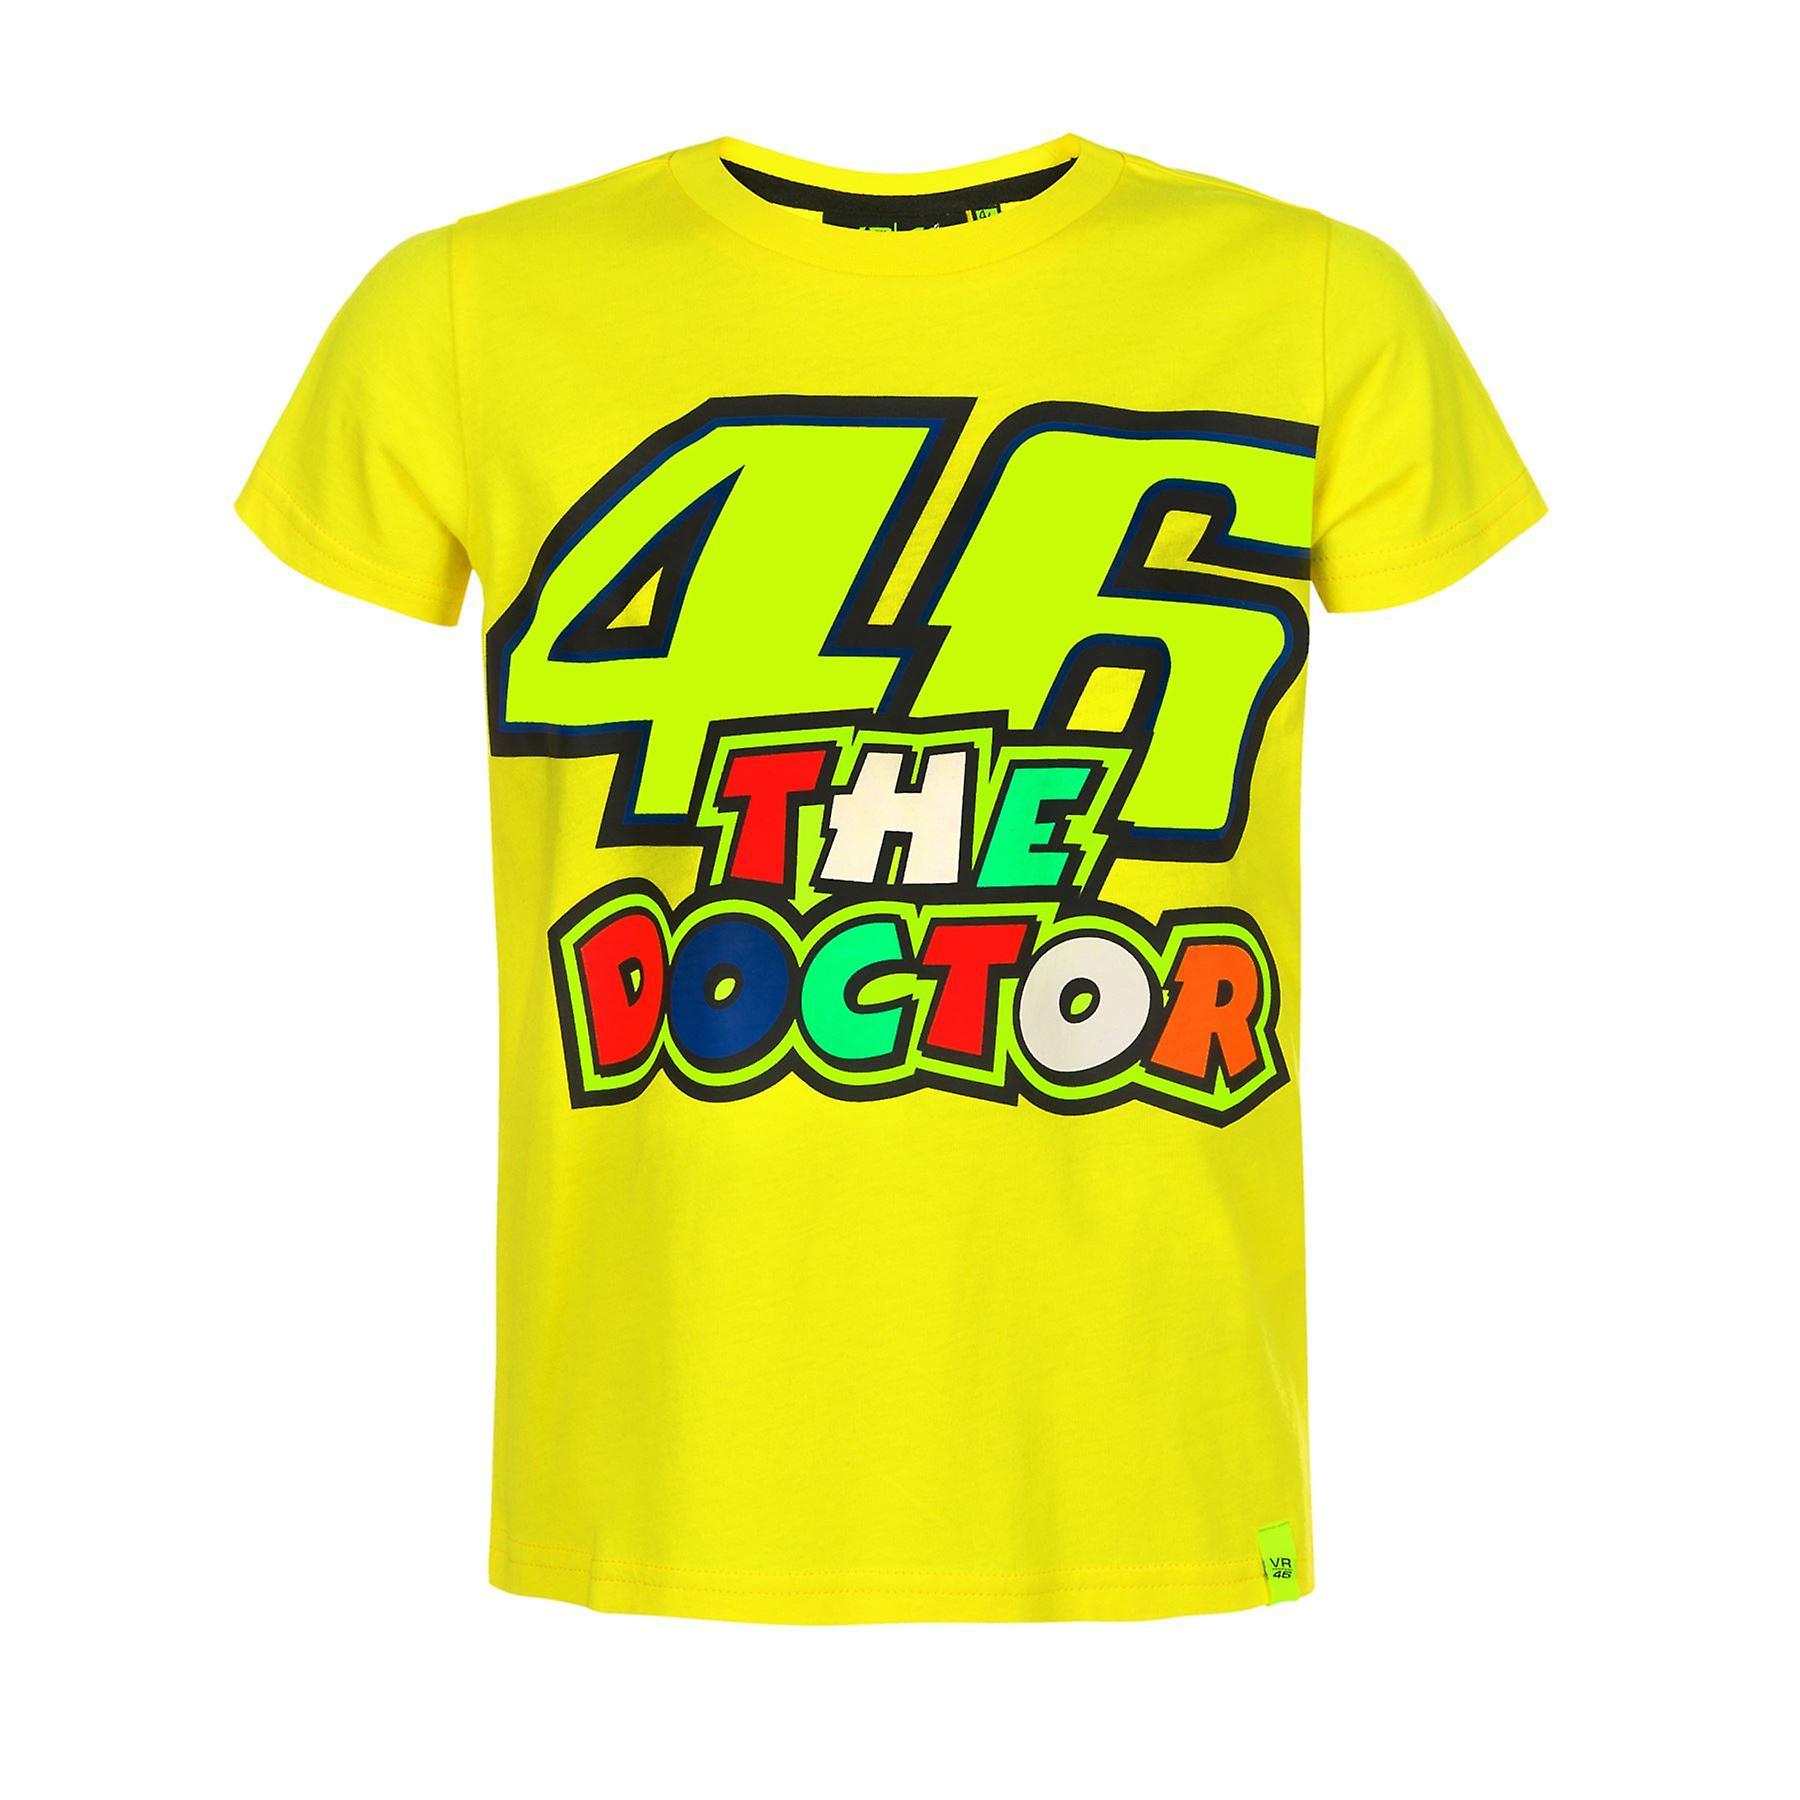 Motogp Valentino Rossi Kinder Streifen T Shirt 2018 Fruugo